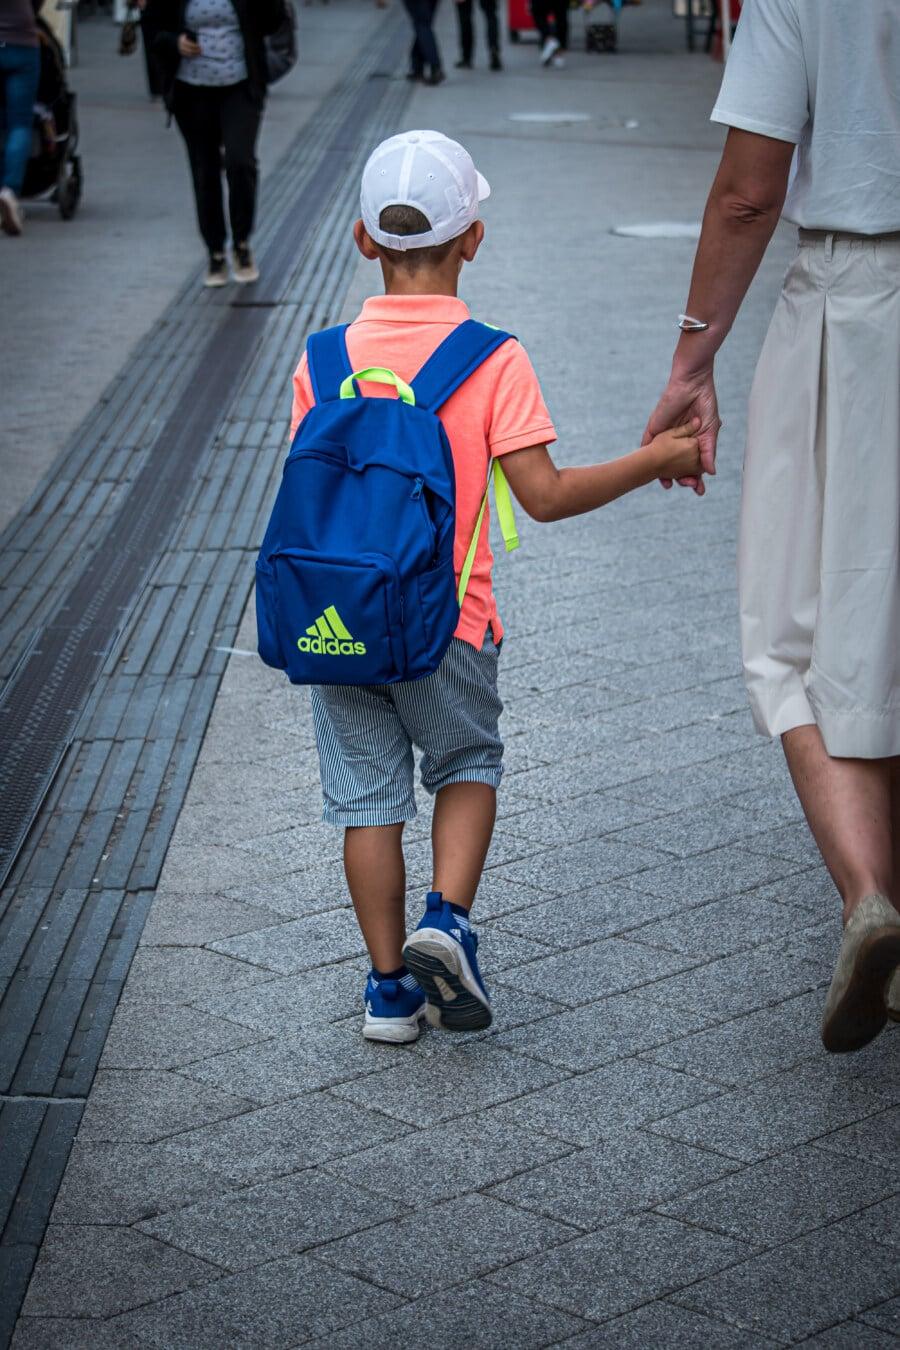 school child, school day, holding hands, mother, son, walking, urban area, street, people, child